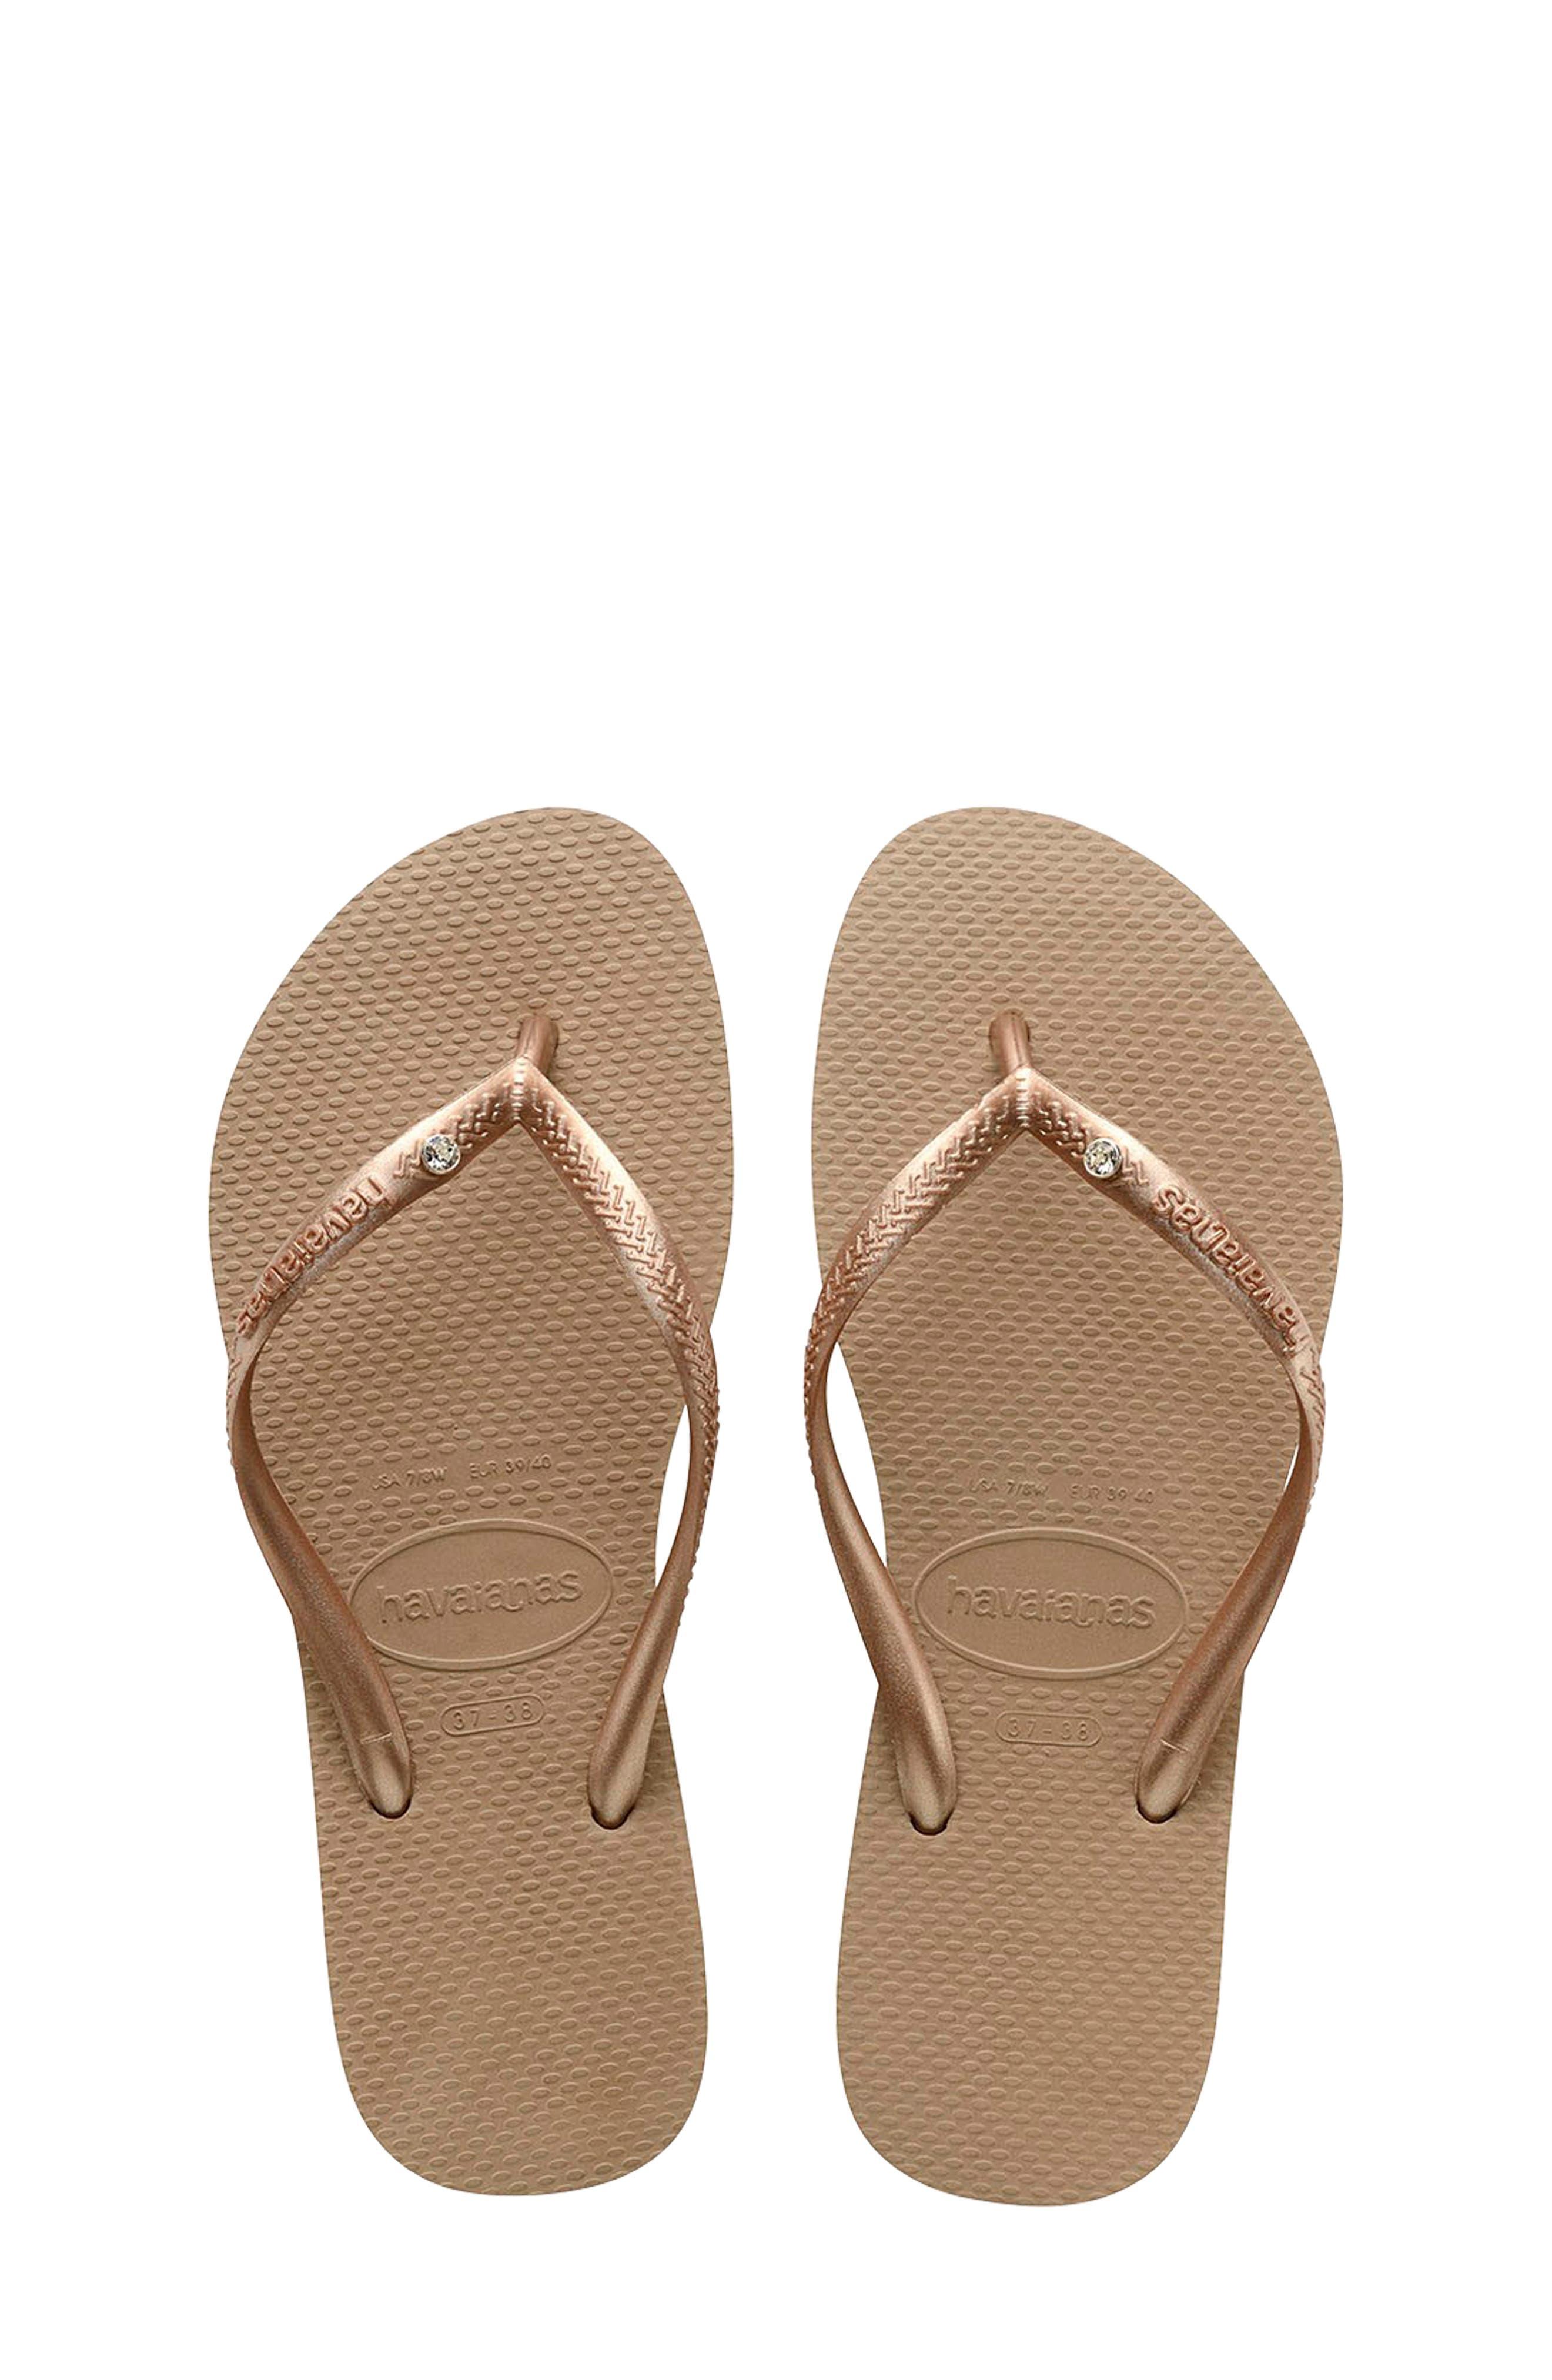 Girls' Havaianas Shoes